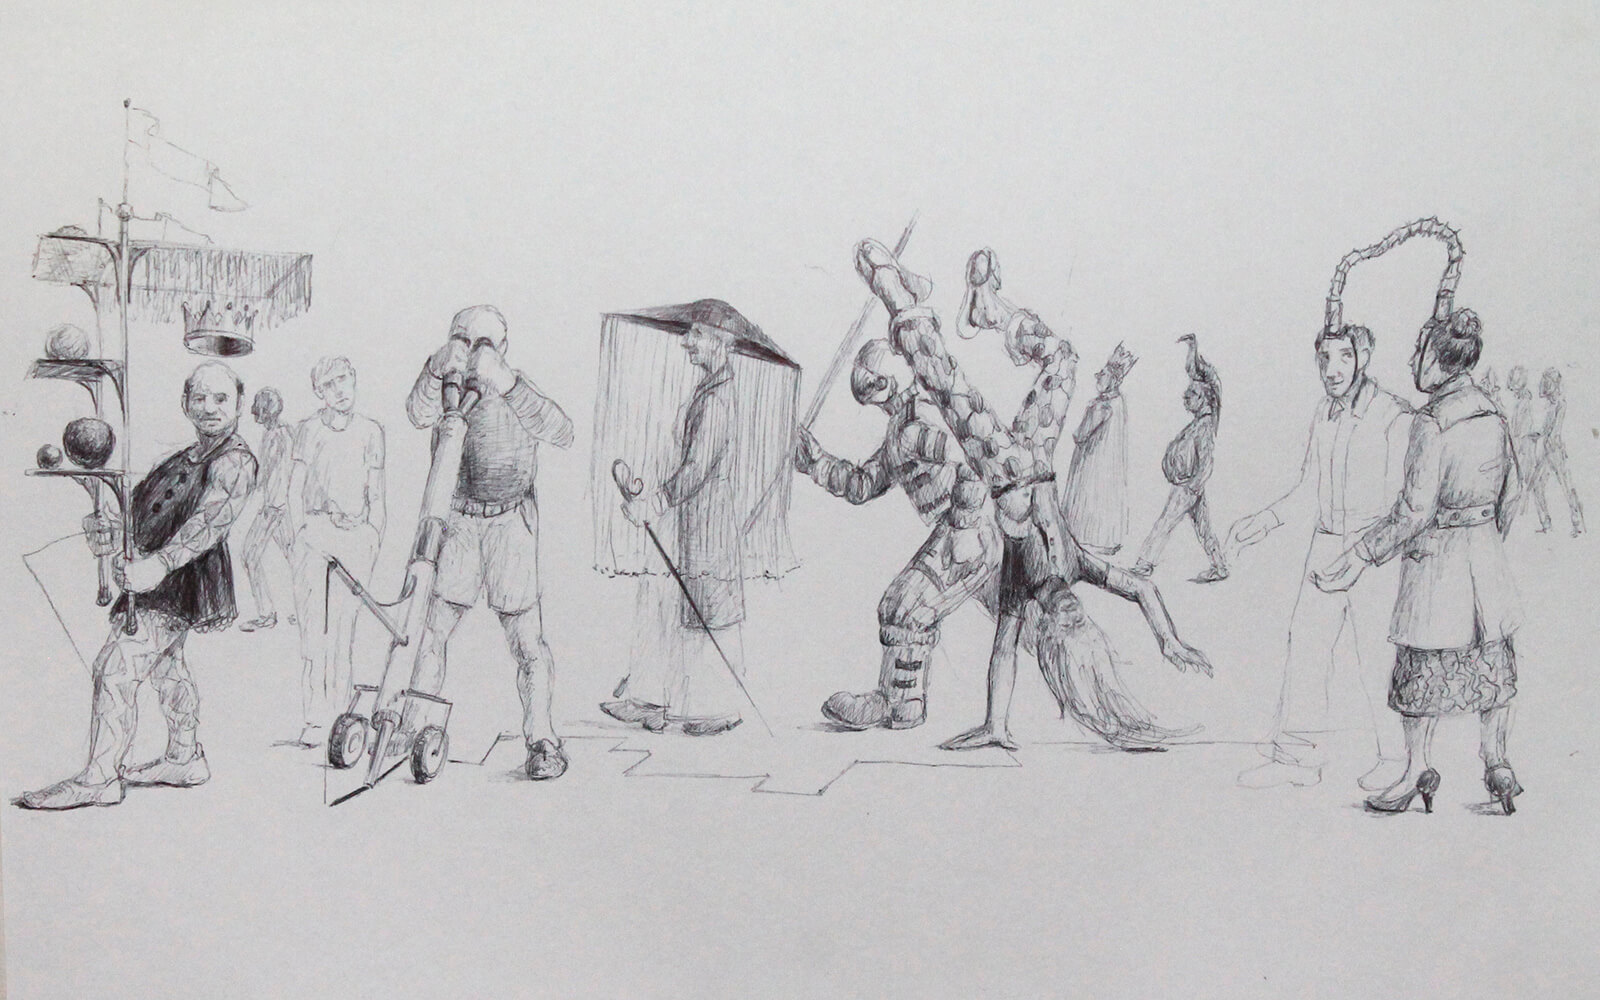 Walker 11 artwork